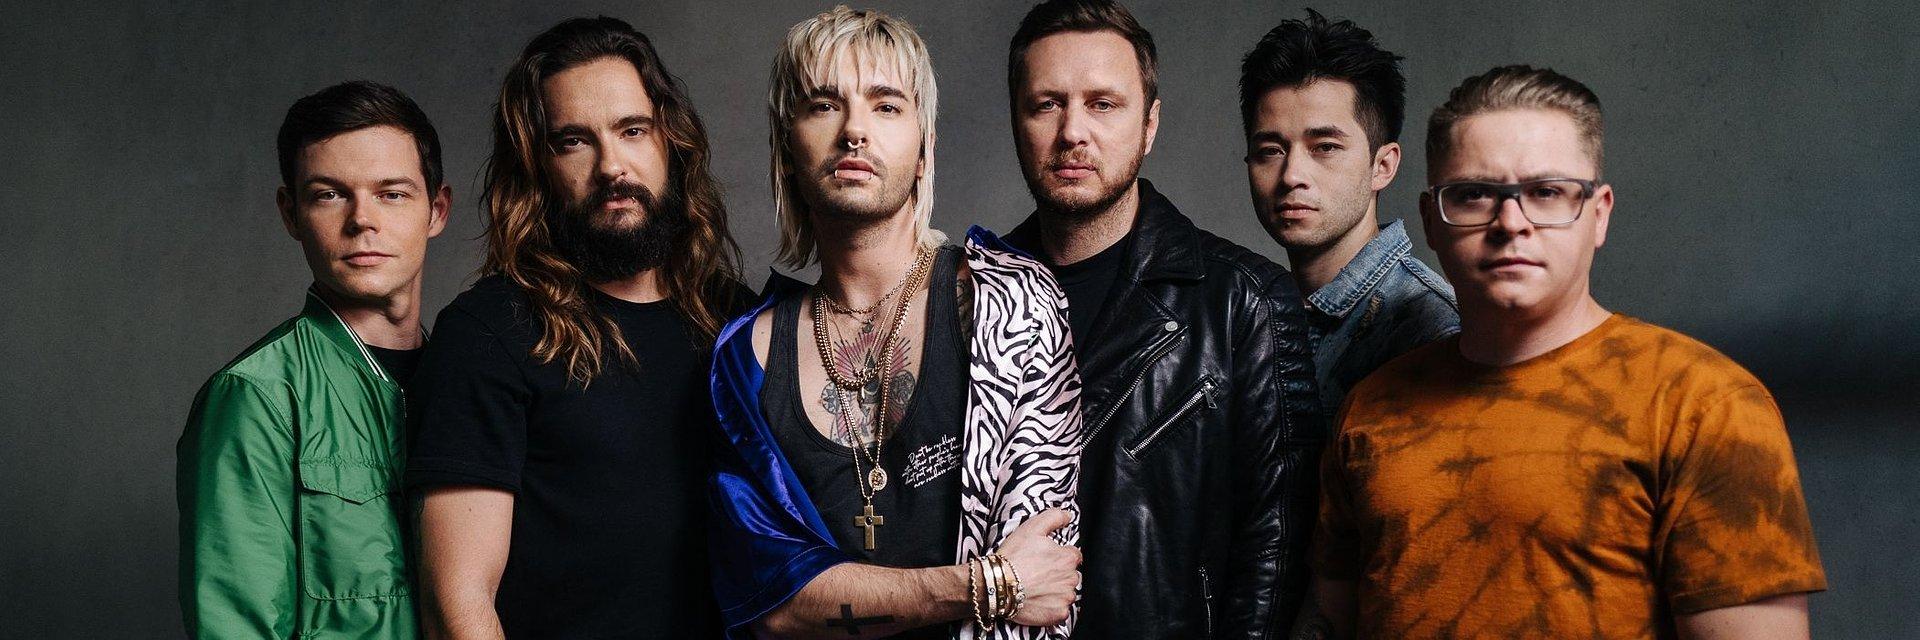 "Tokio Hotel i VIZE w coverze ""Behind Blue Eyes"""